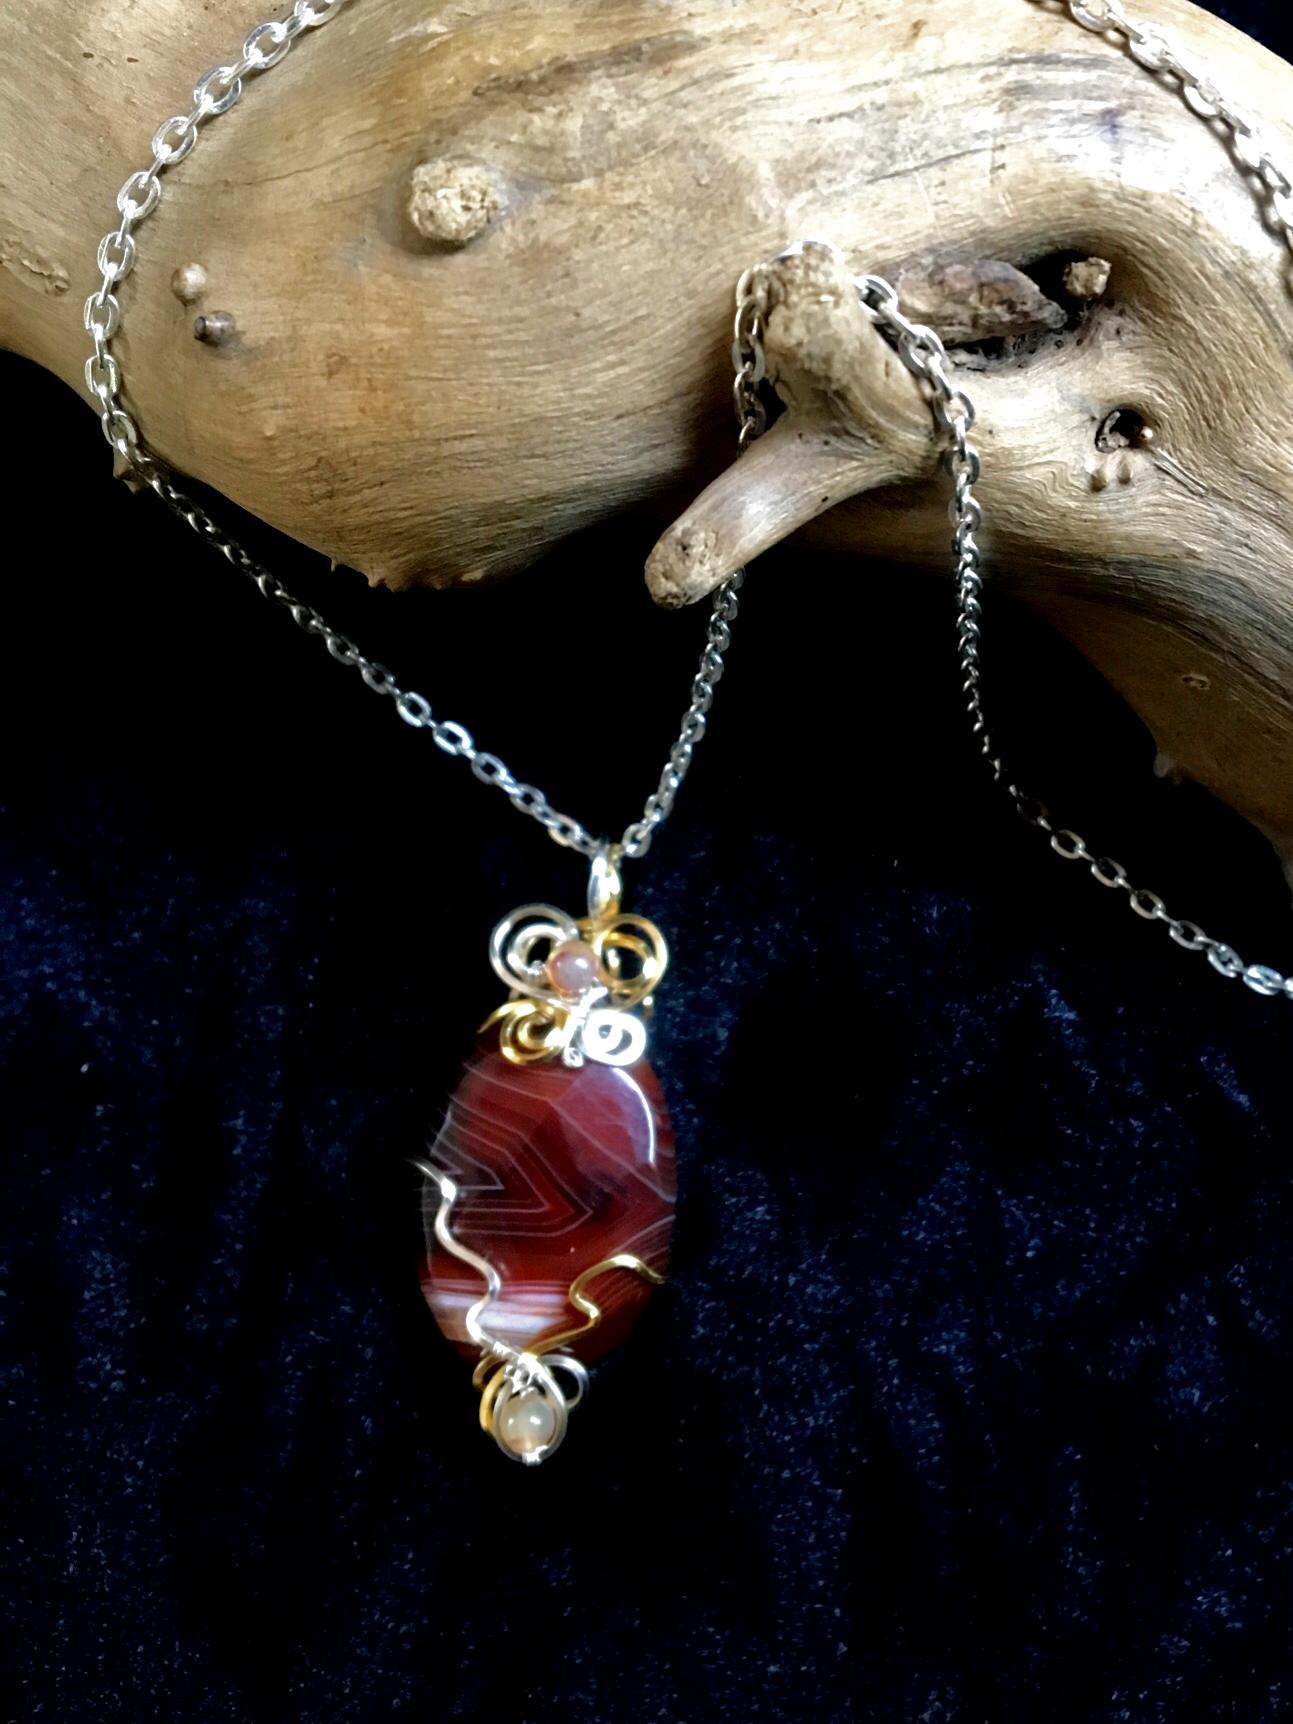 Qhresnna Quartz Necklace - Brown Agathe 1- Silver Plated